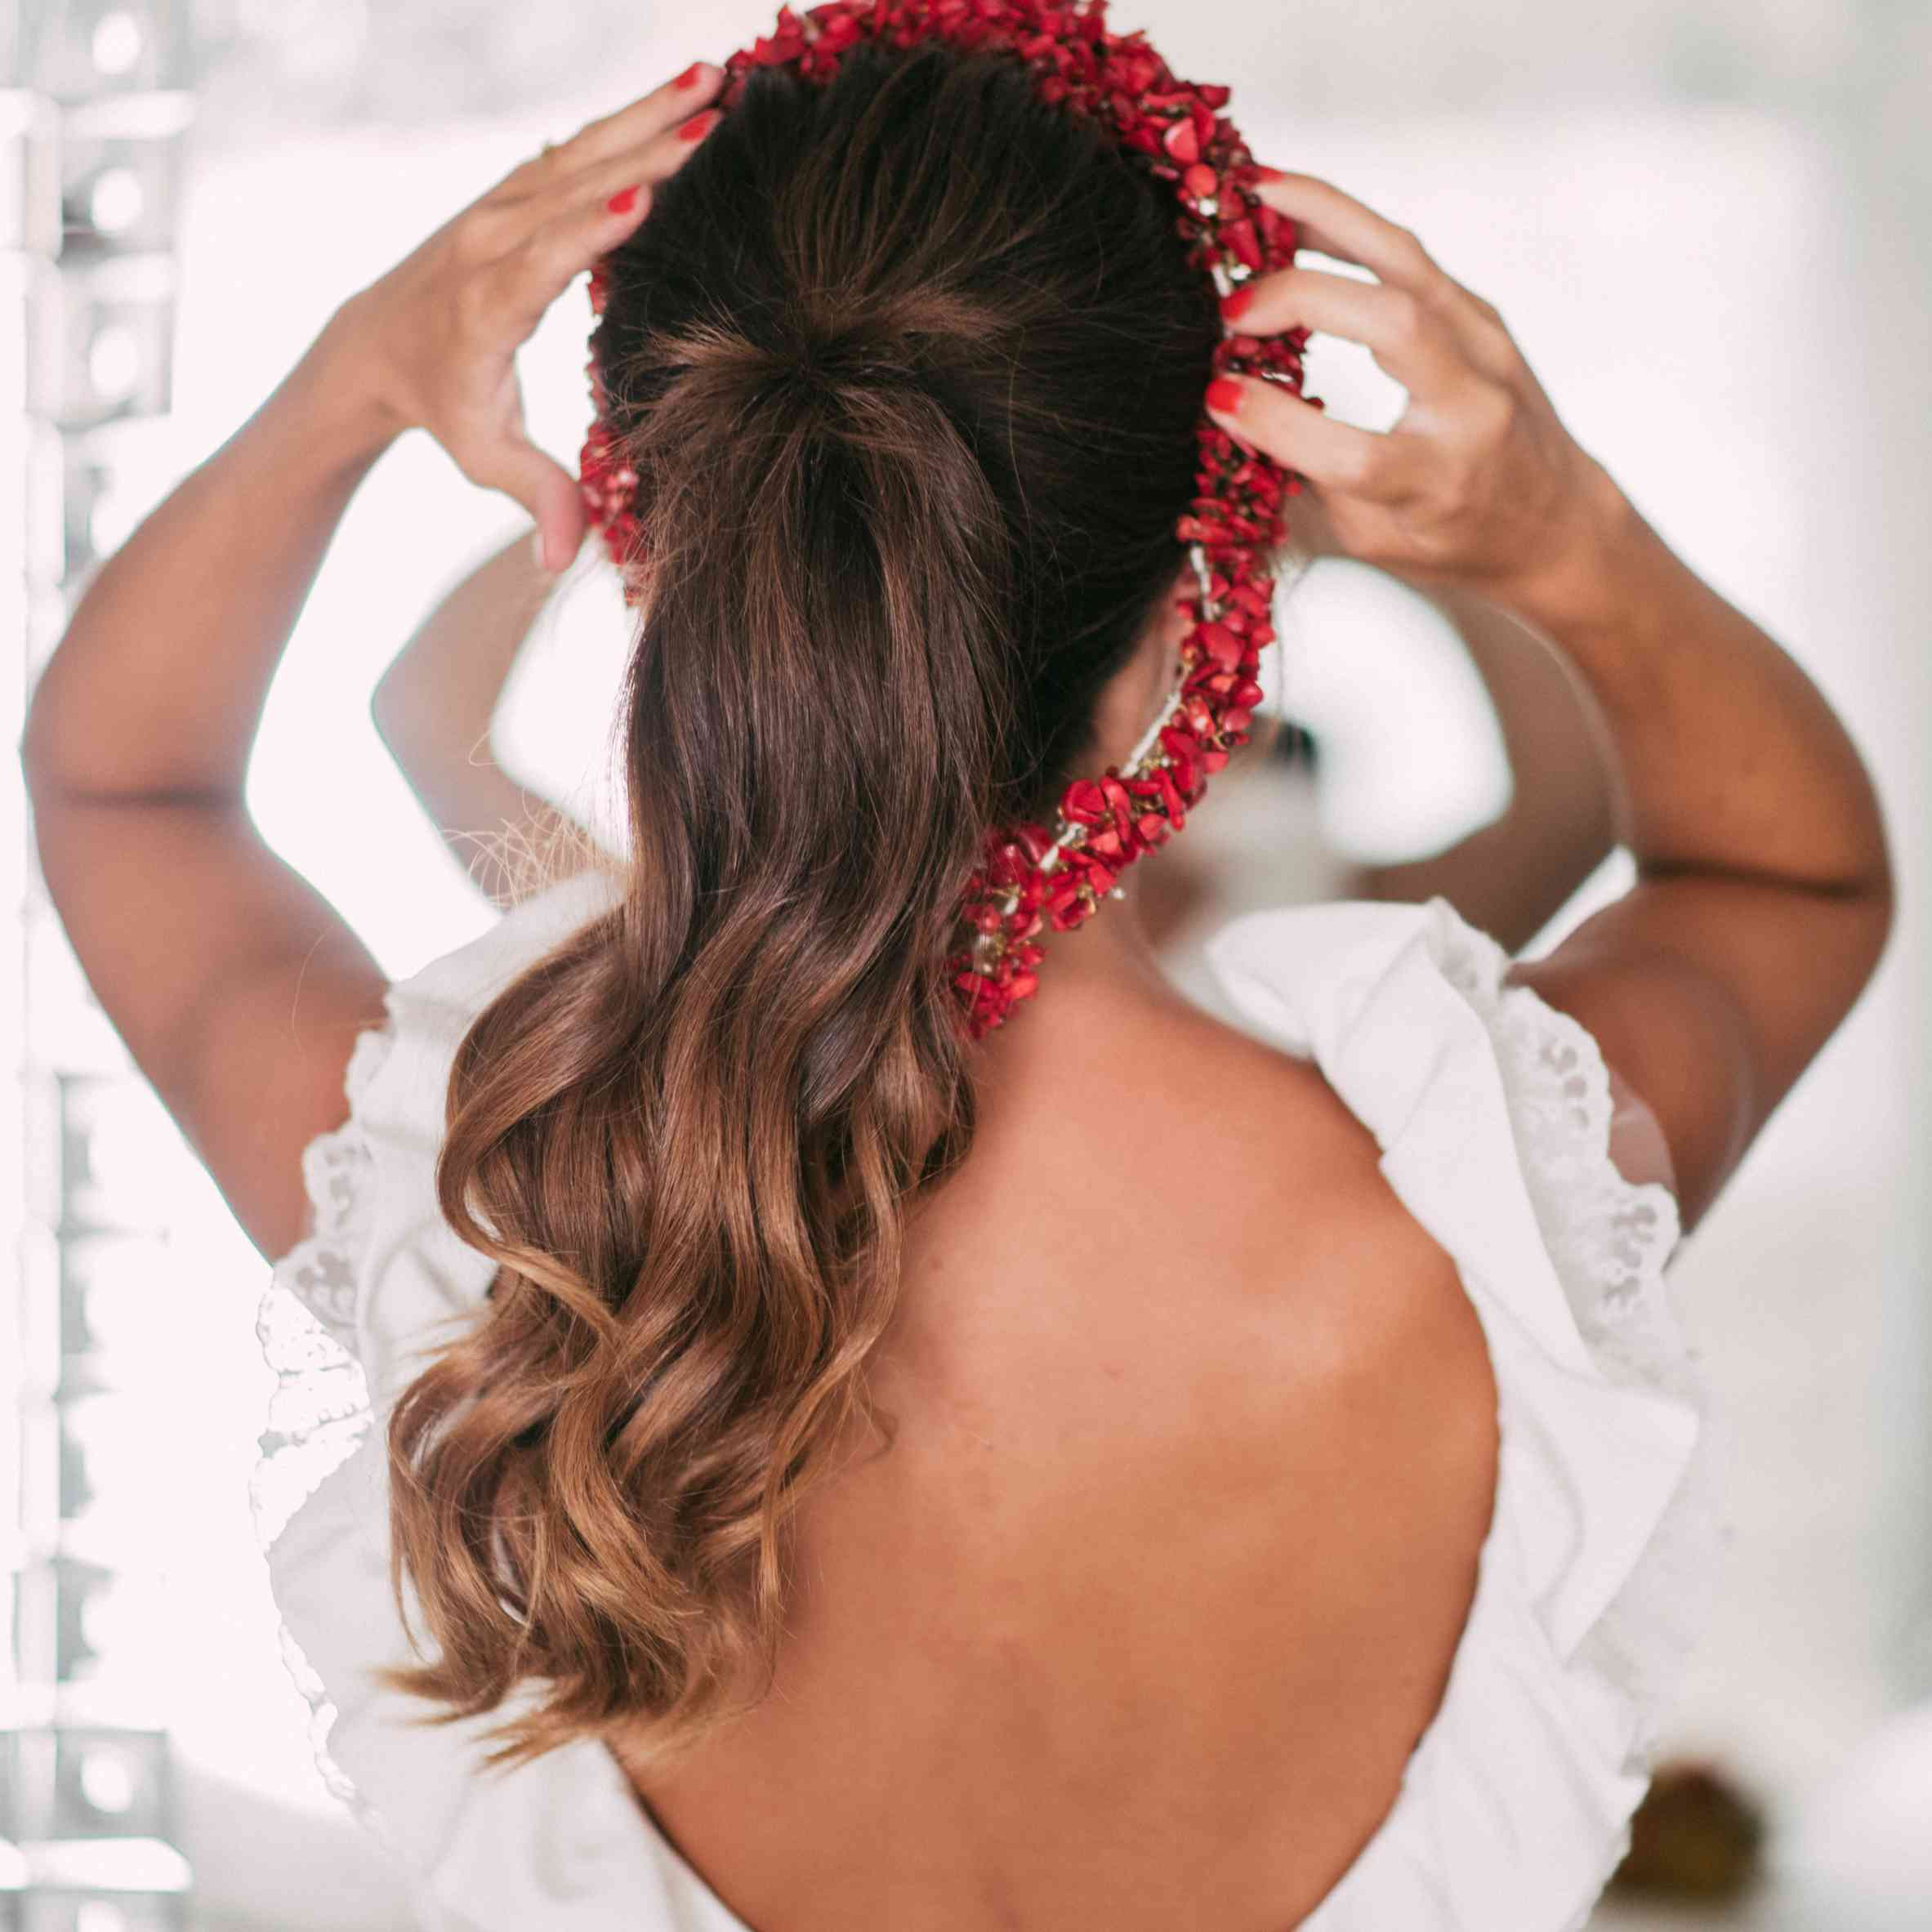 Bride putting on floral crown